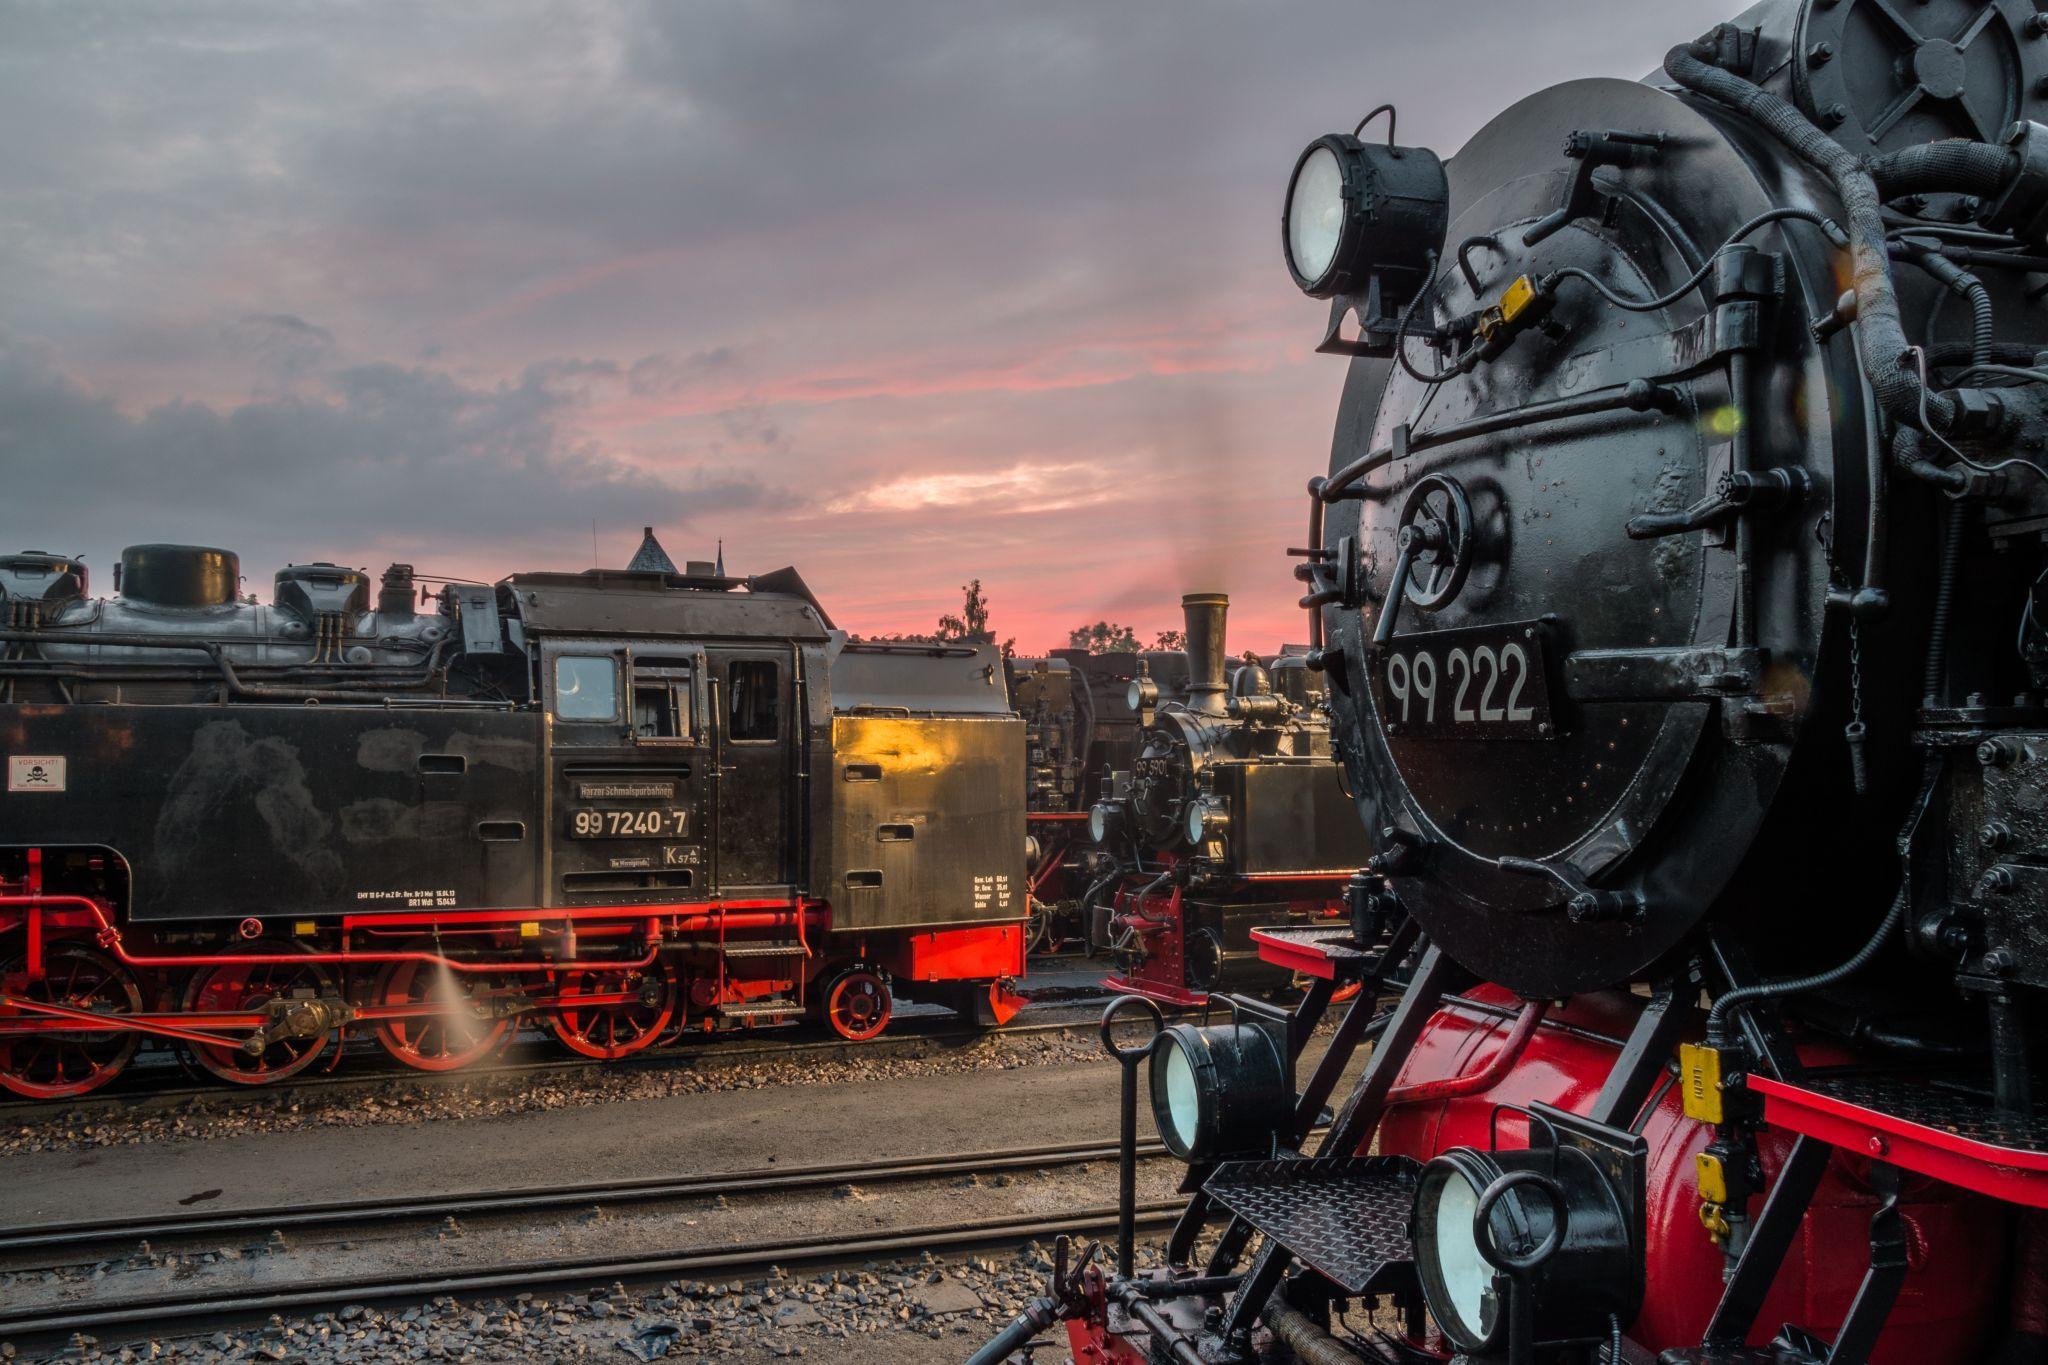 Depot Of The Harzer Schmalspurbahnen Wernigerode Harz Germany